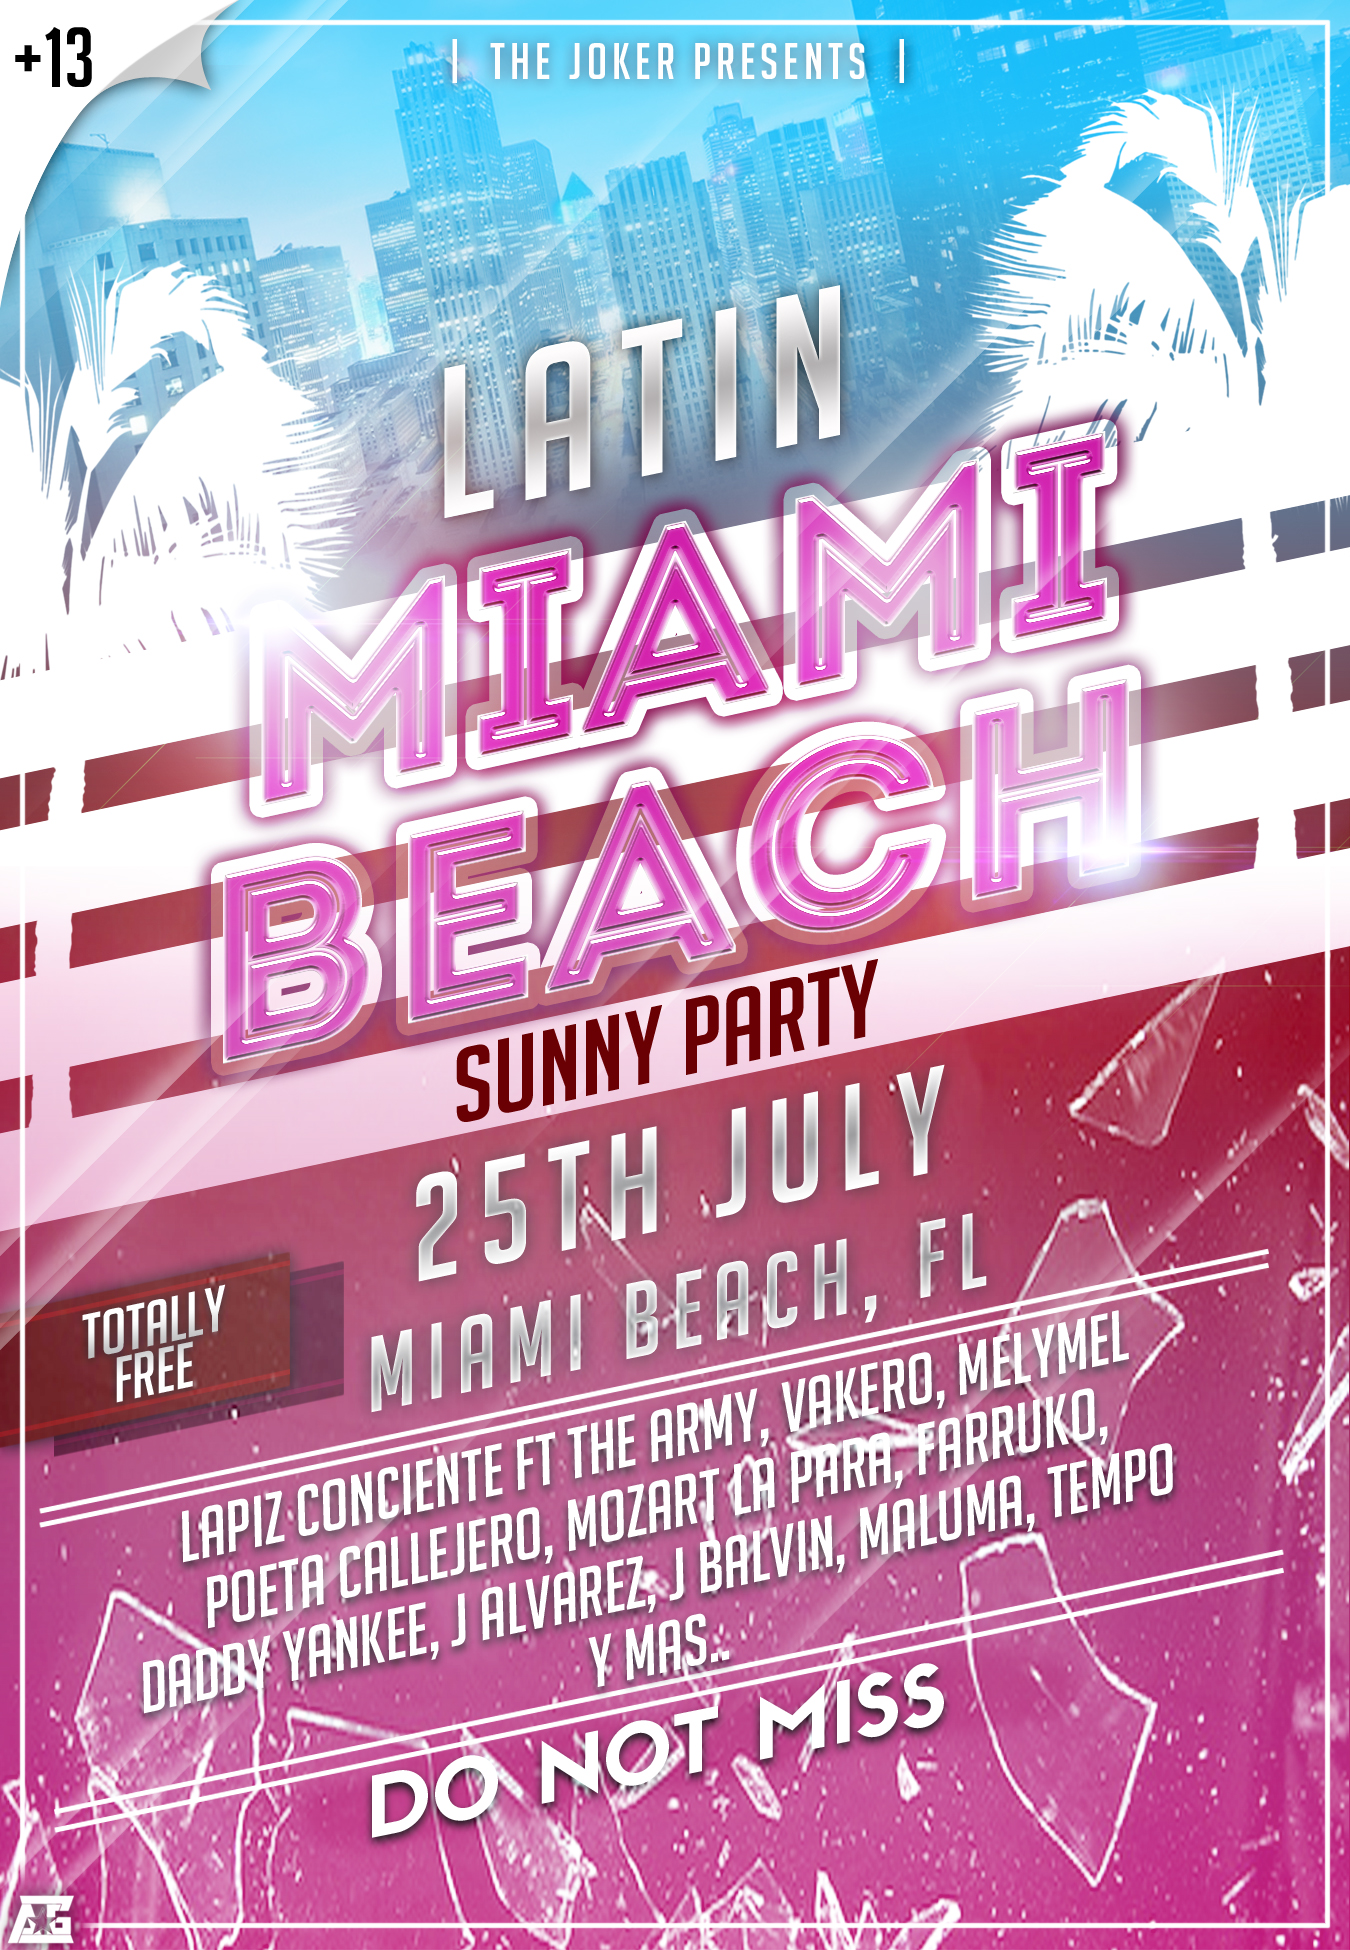 Latin Miami Beach Sunny Party Flyer By Alberto44